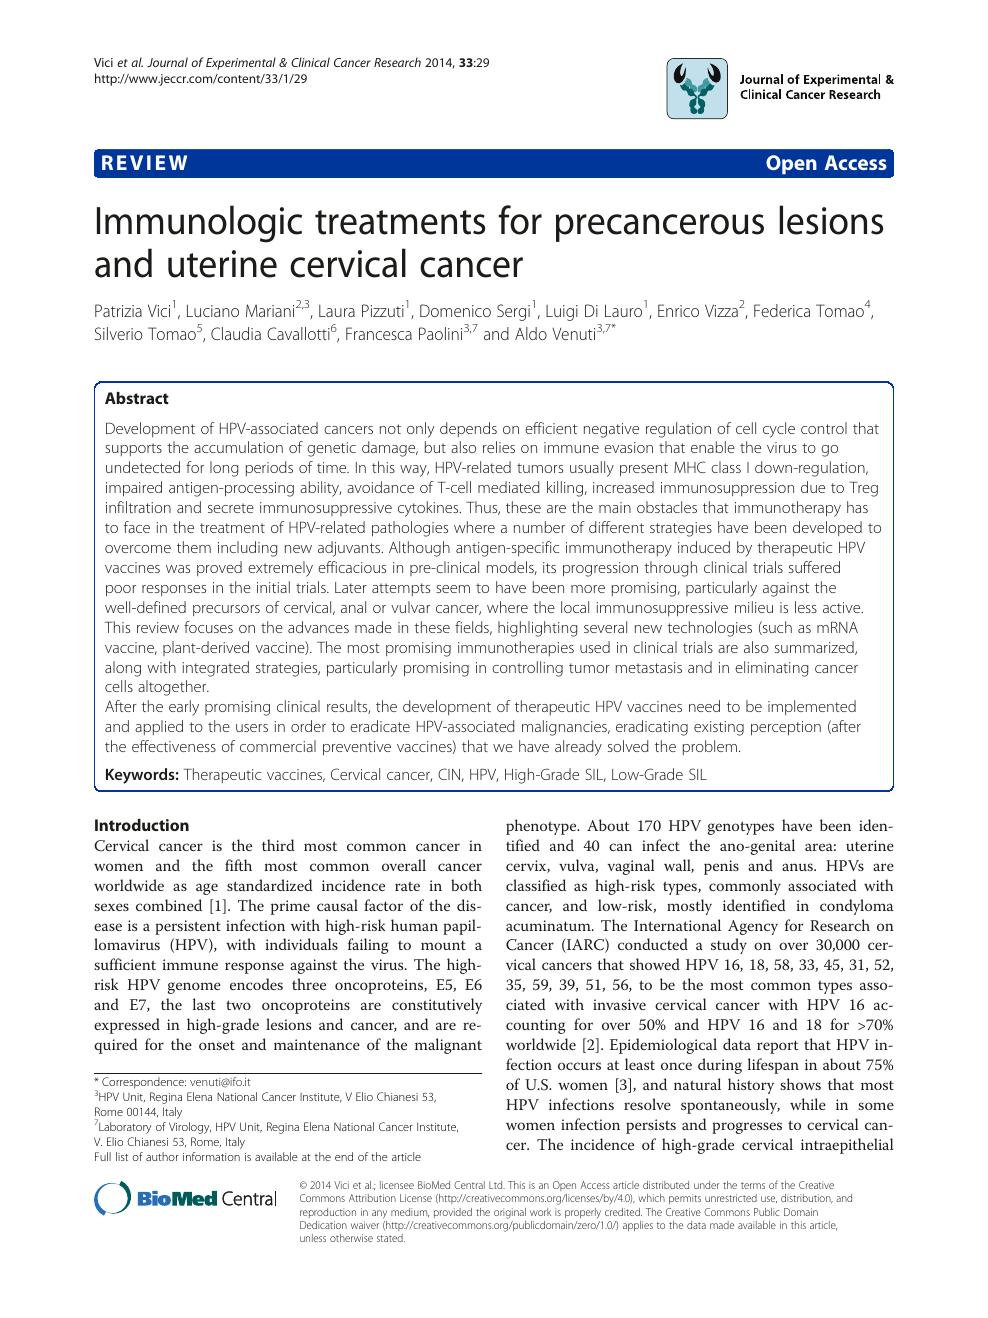 hpv precancerous lesion treatment